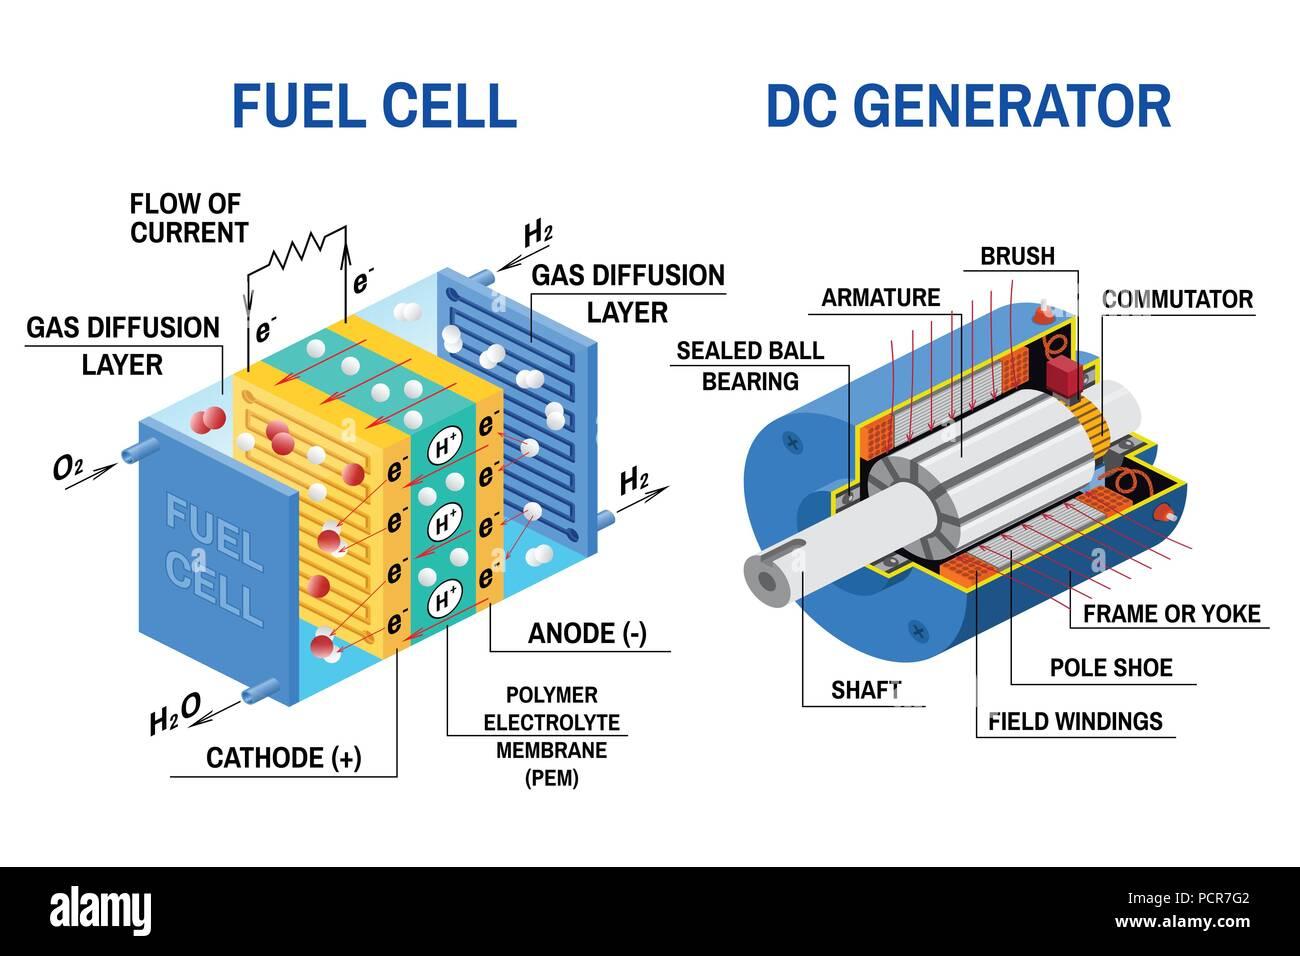 Dc Generator Stock Photos & Dc Generator Stock Images - Alamy on